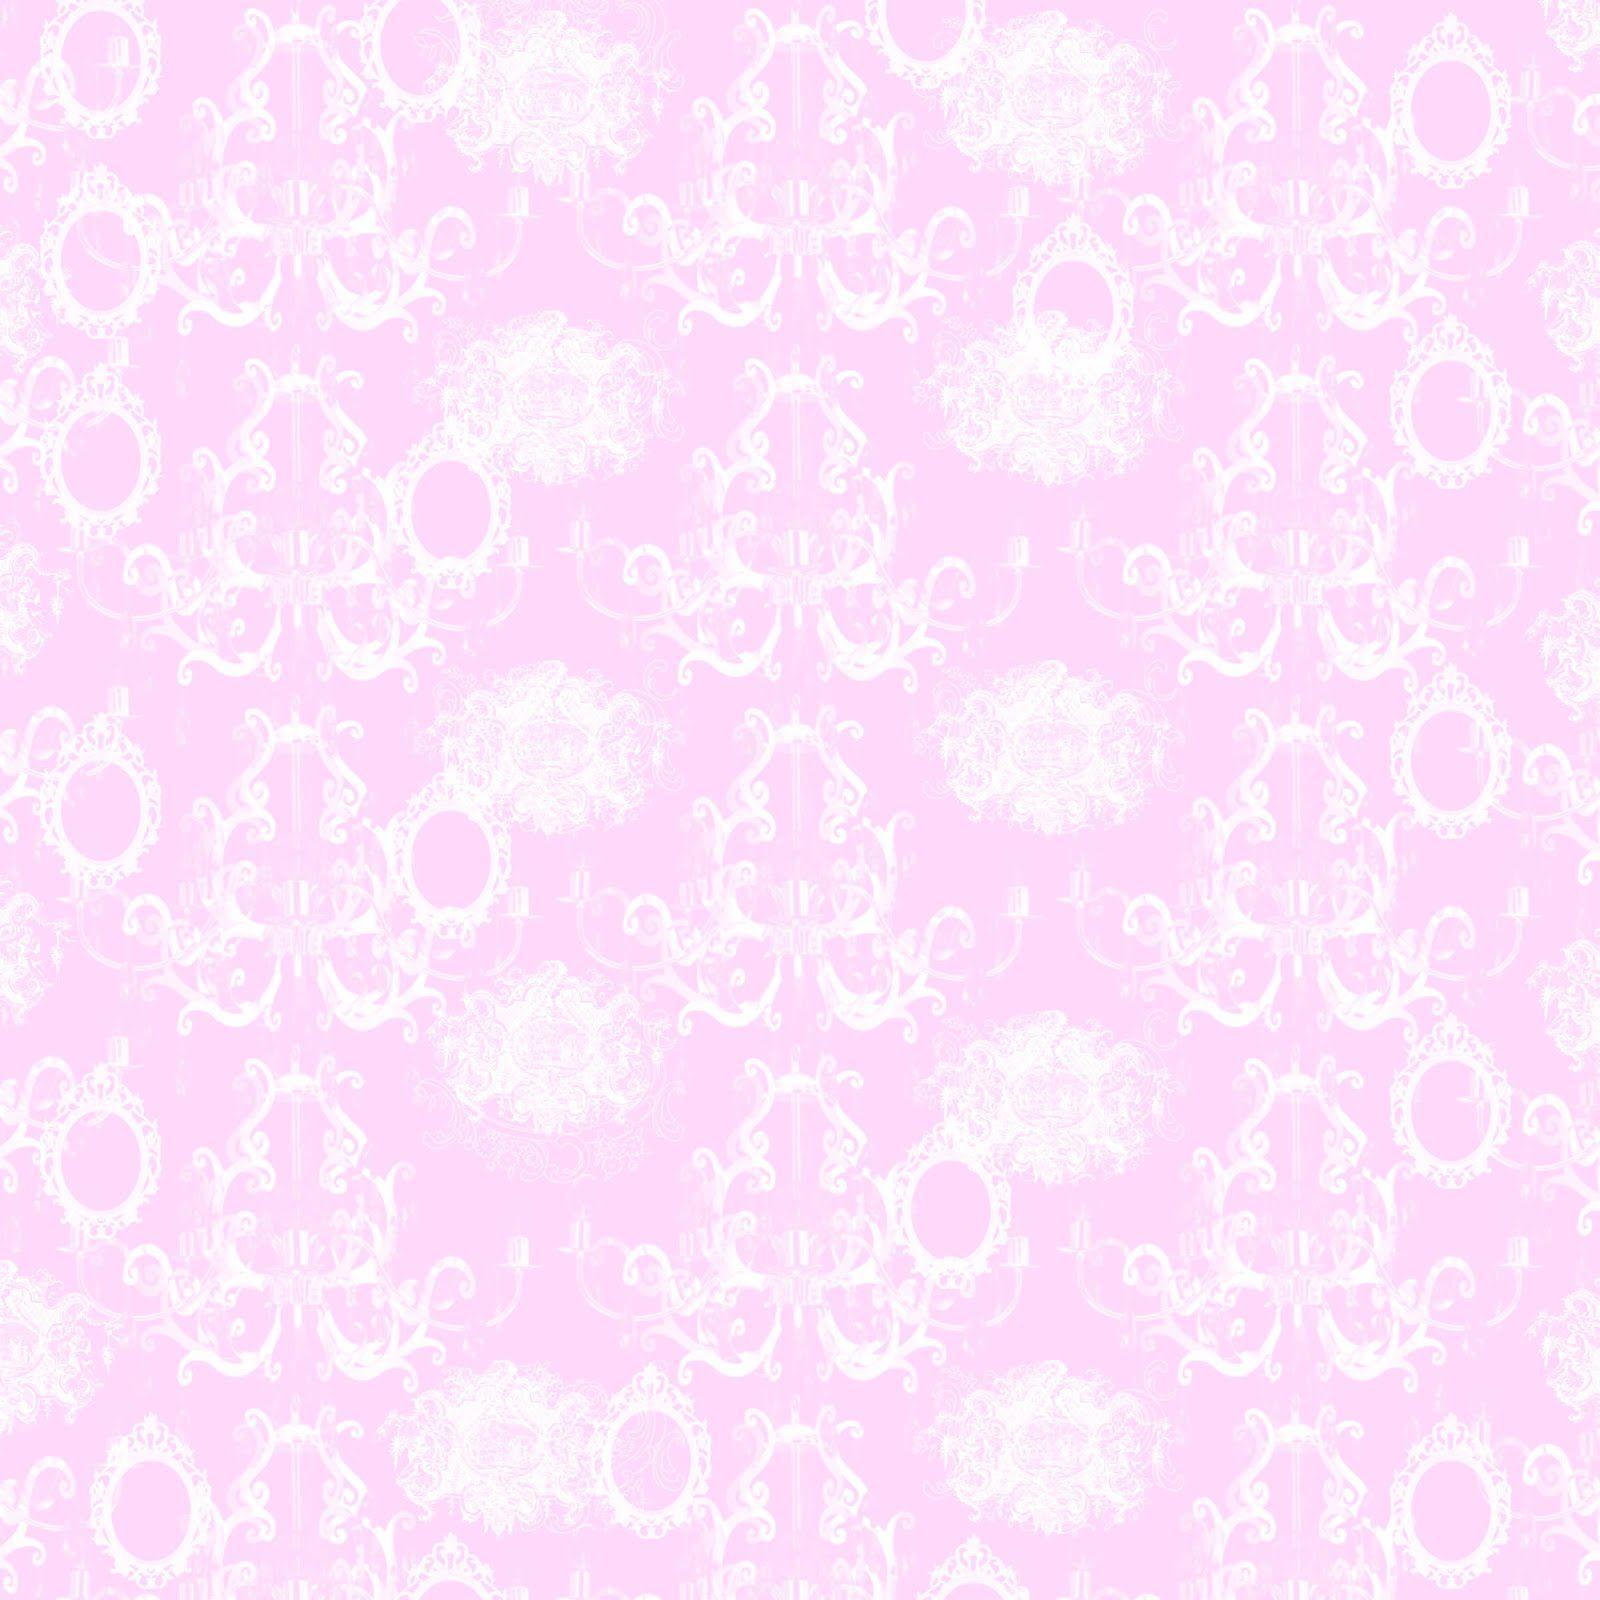 Scrapbook paper download - Pink Shabby Digital Scrapbook Paper Download